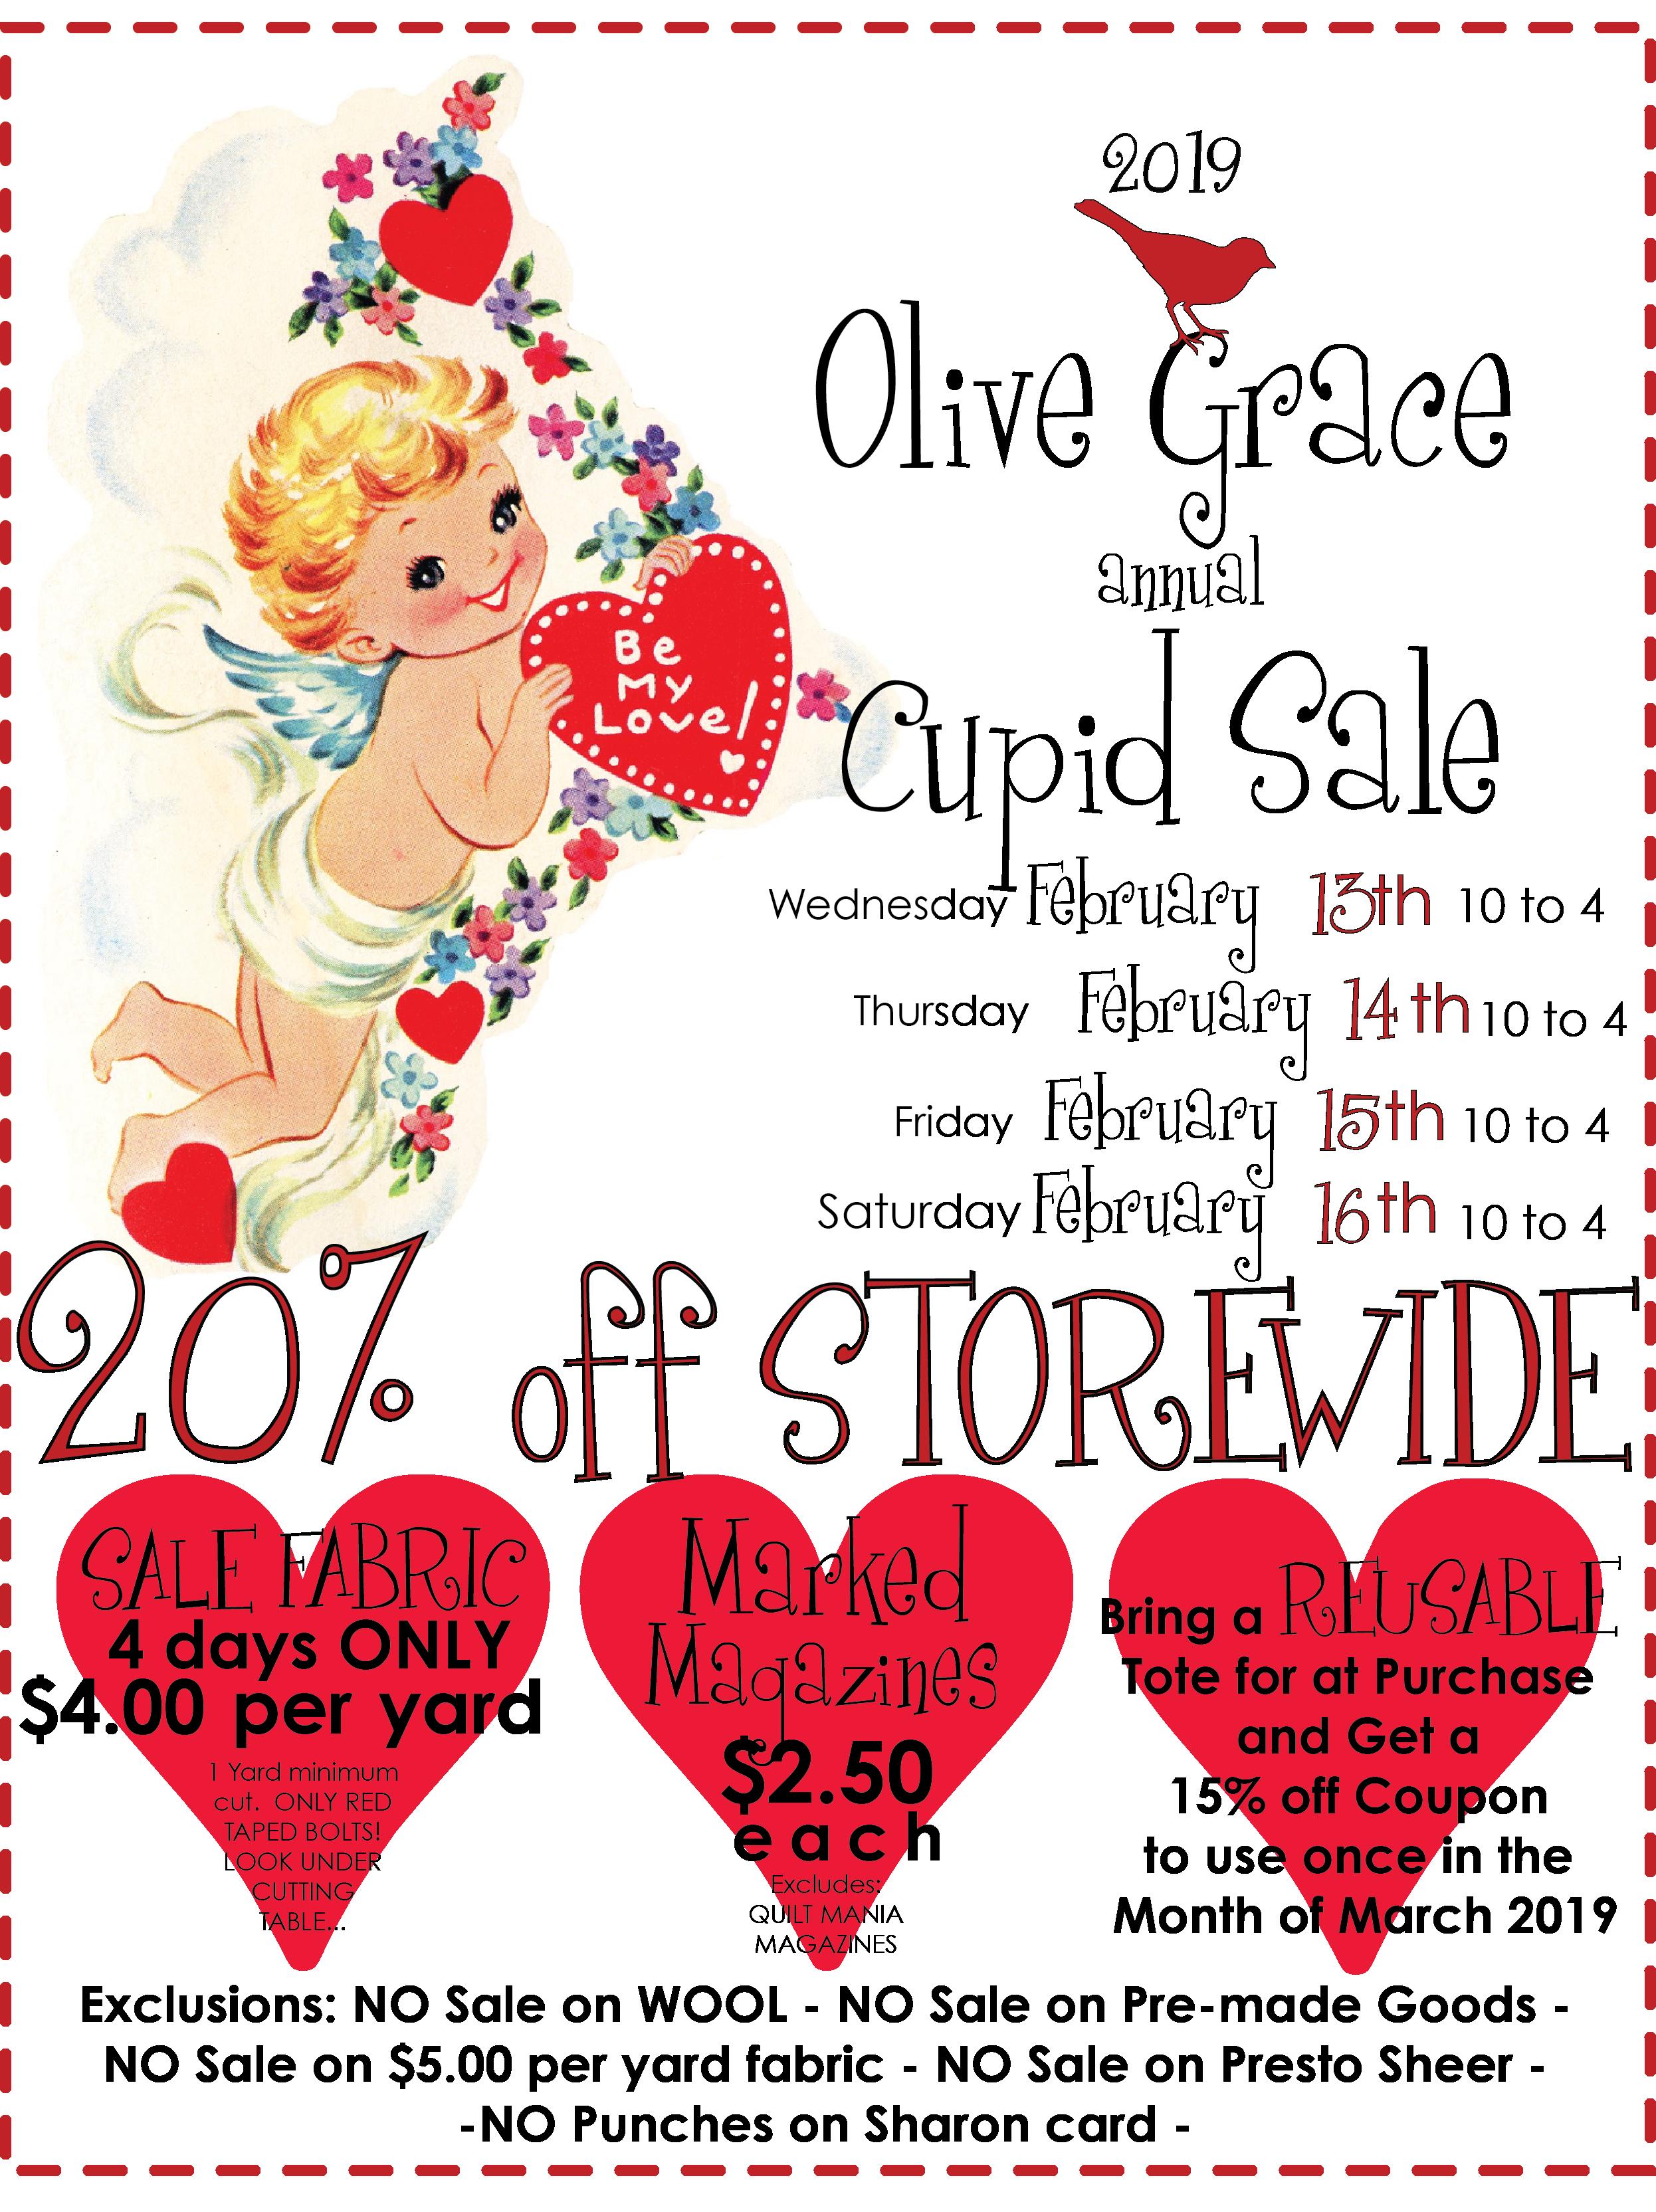 Cupid Sale 2019.png